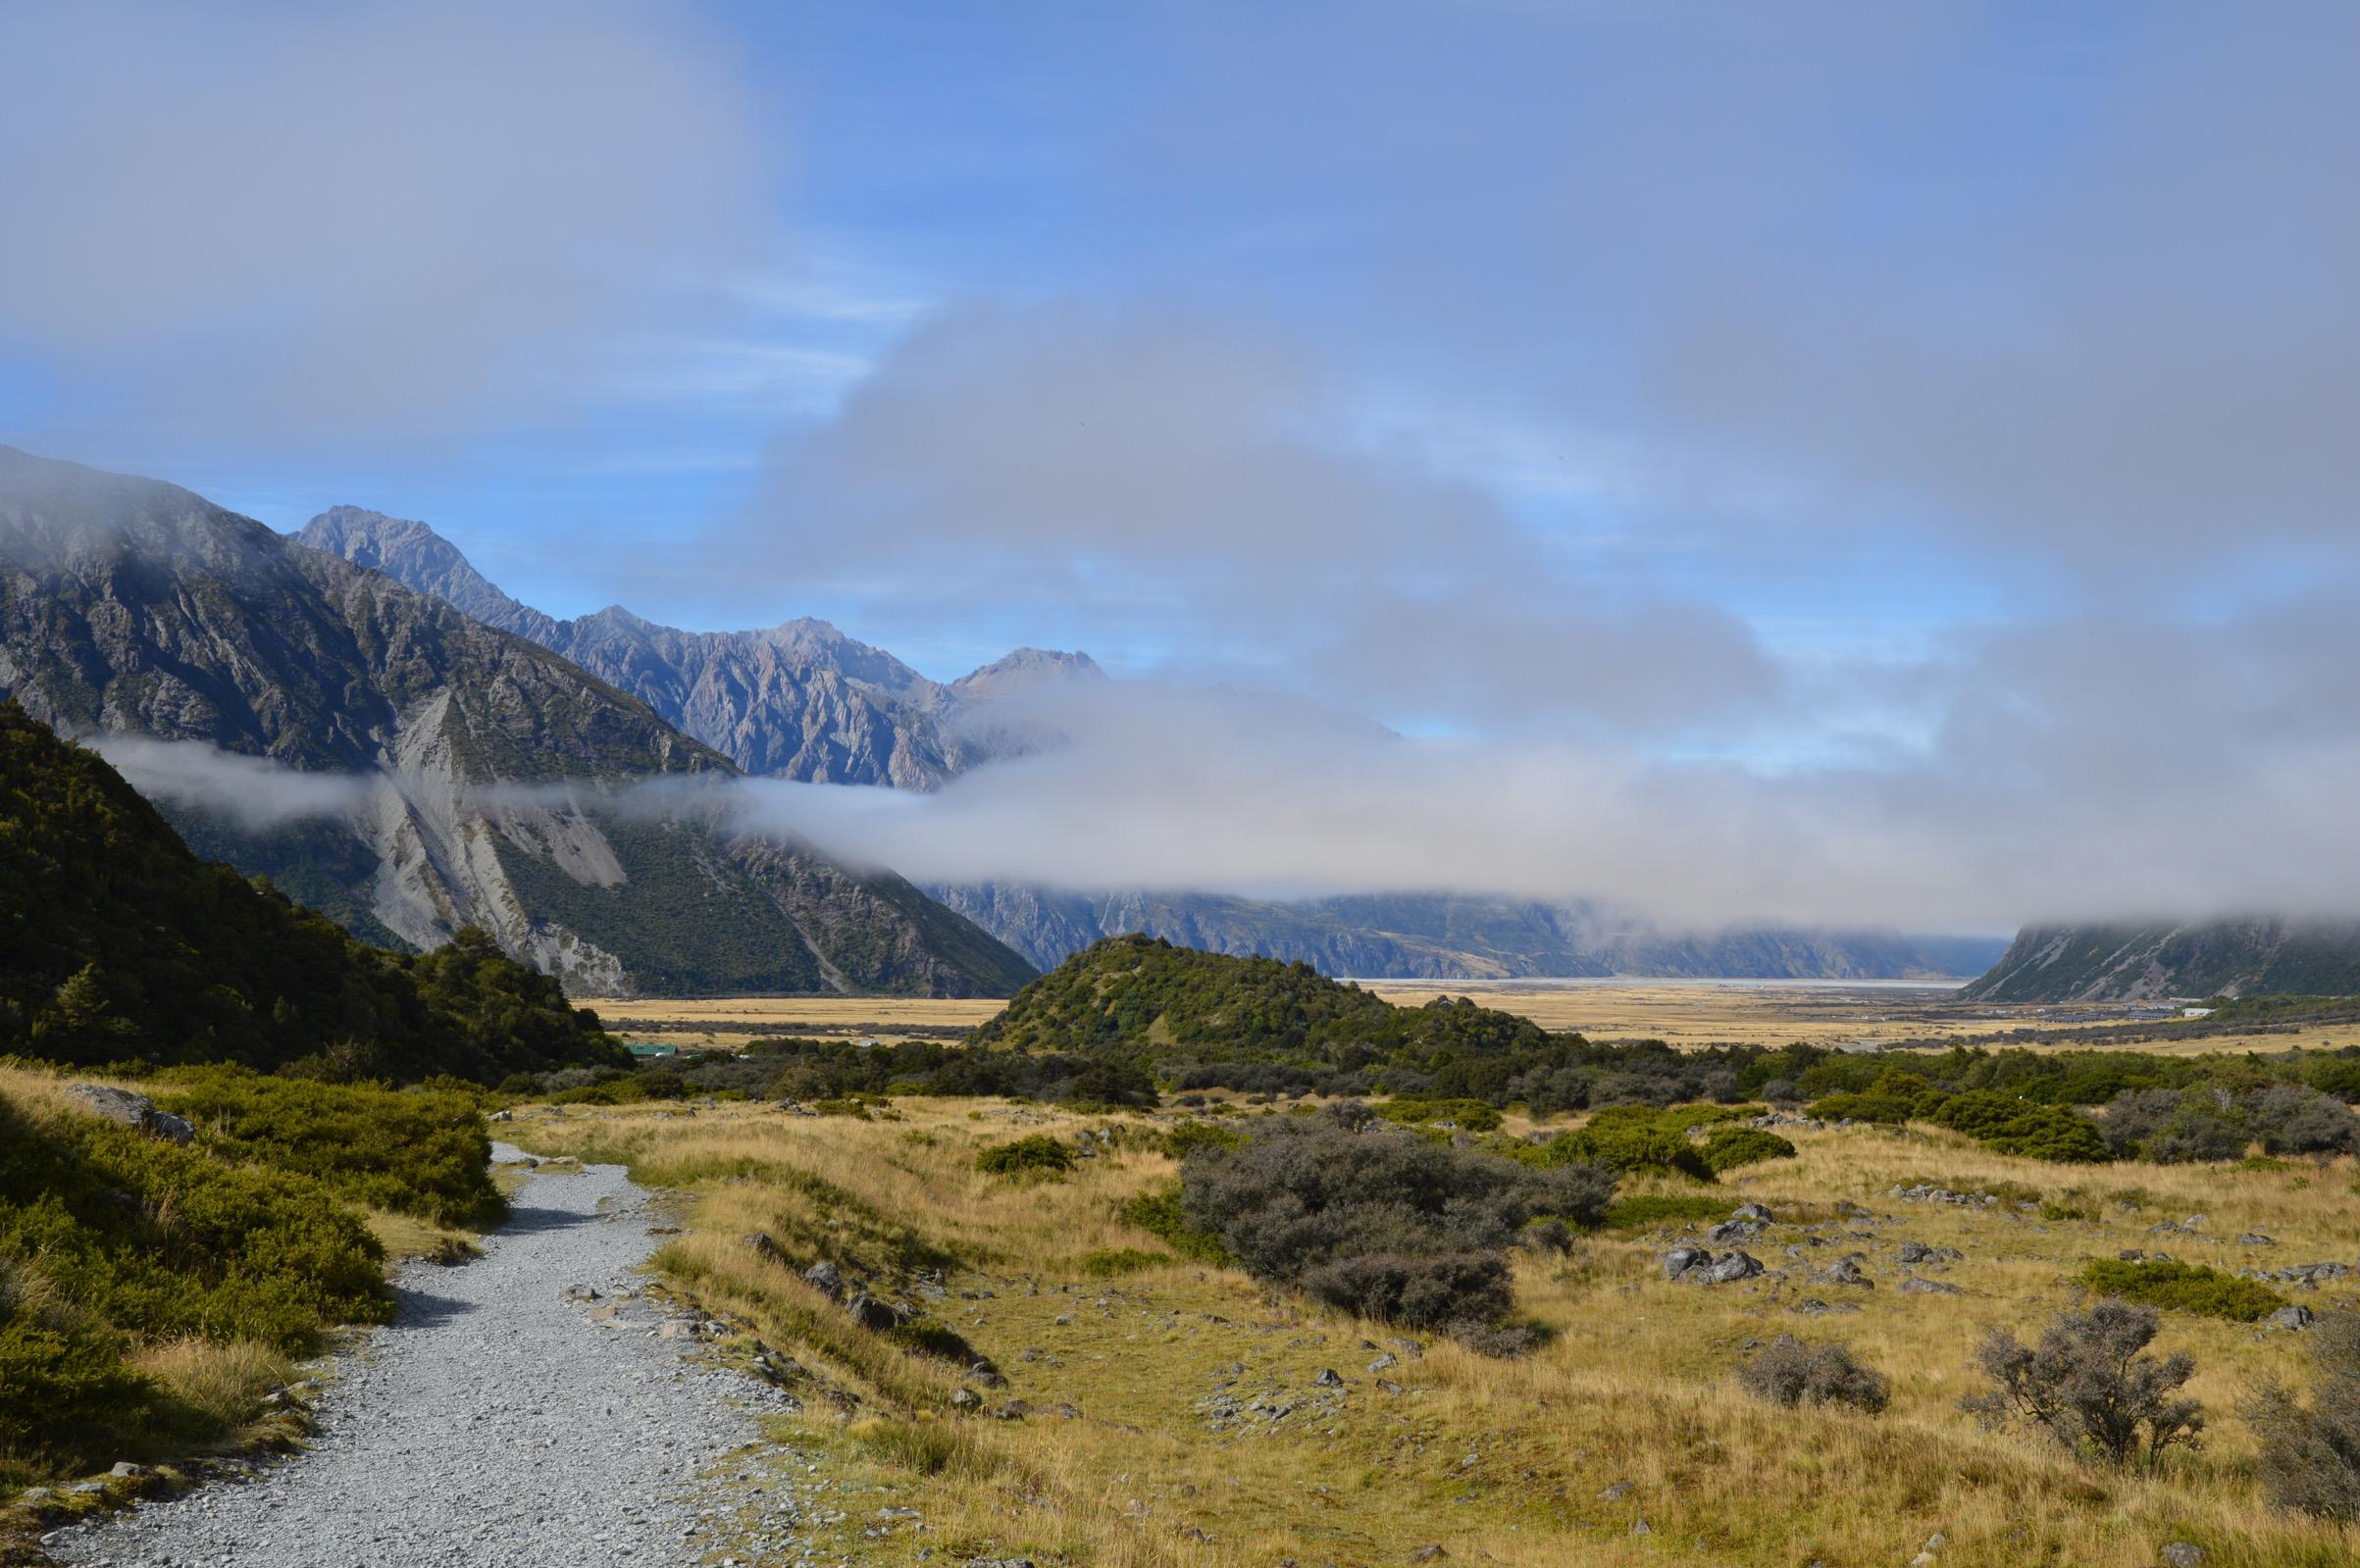 Kea Point track, Aoraki/Mount Cook National Park, New Zealand